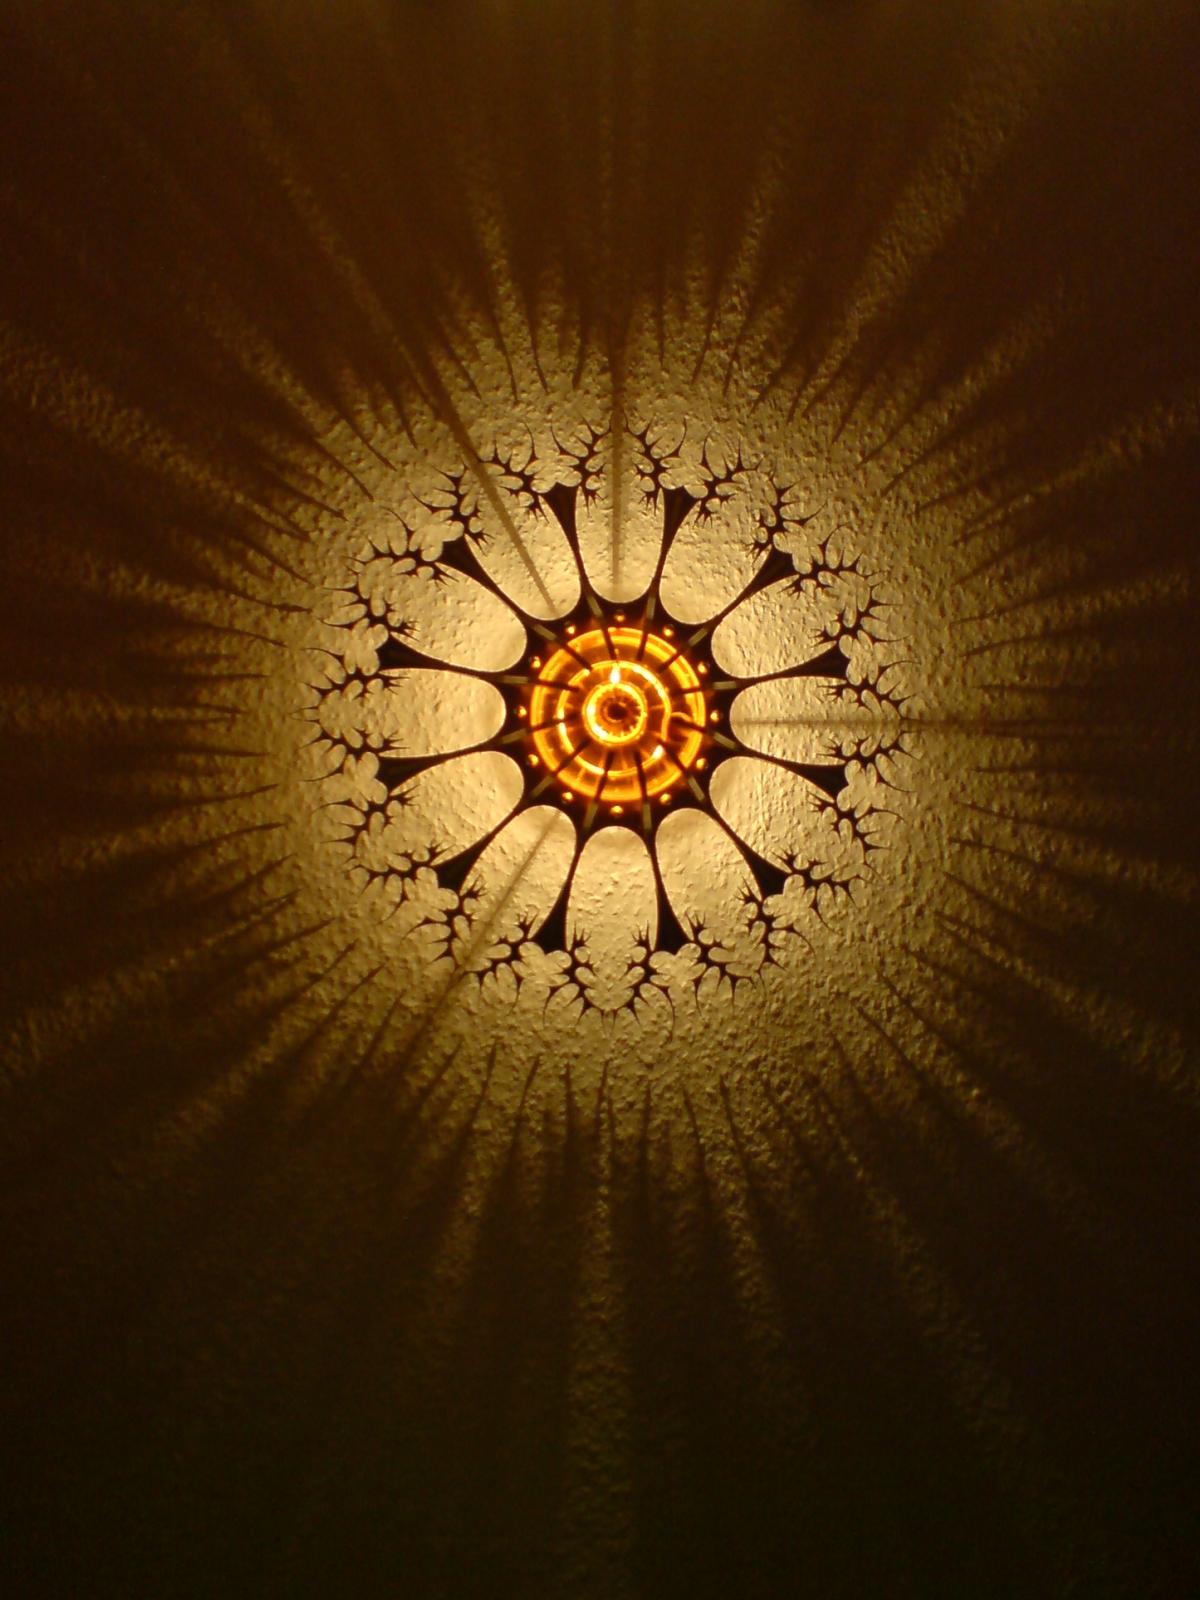 Artistic Light Fixtures file:light fixture, light art, very artistic - wikimedia commons